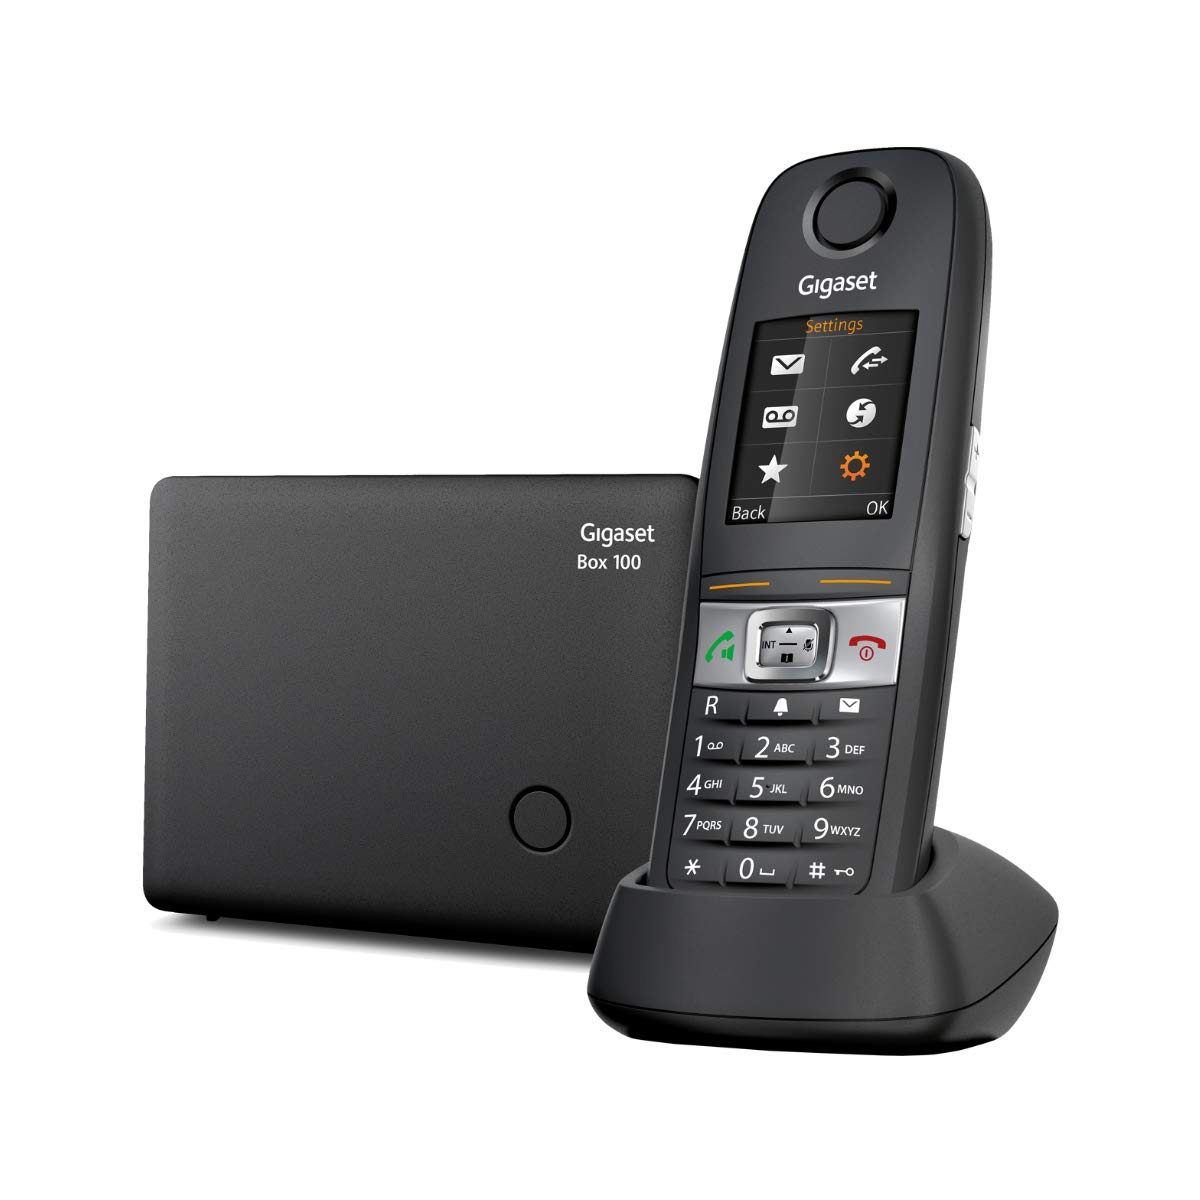 Gigaset E630 - Teléfono Inalámbrico Resistente a Polvo, Golpes y Salpicaduras, Color Negro: Gigaset: Amazon.es: Electrónica